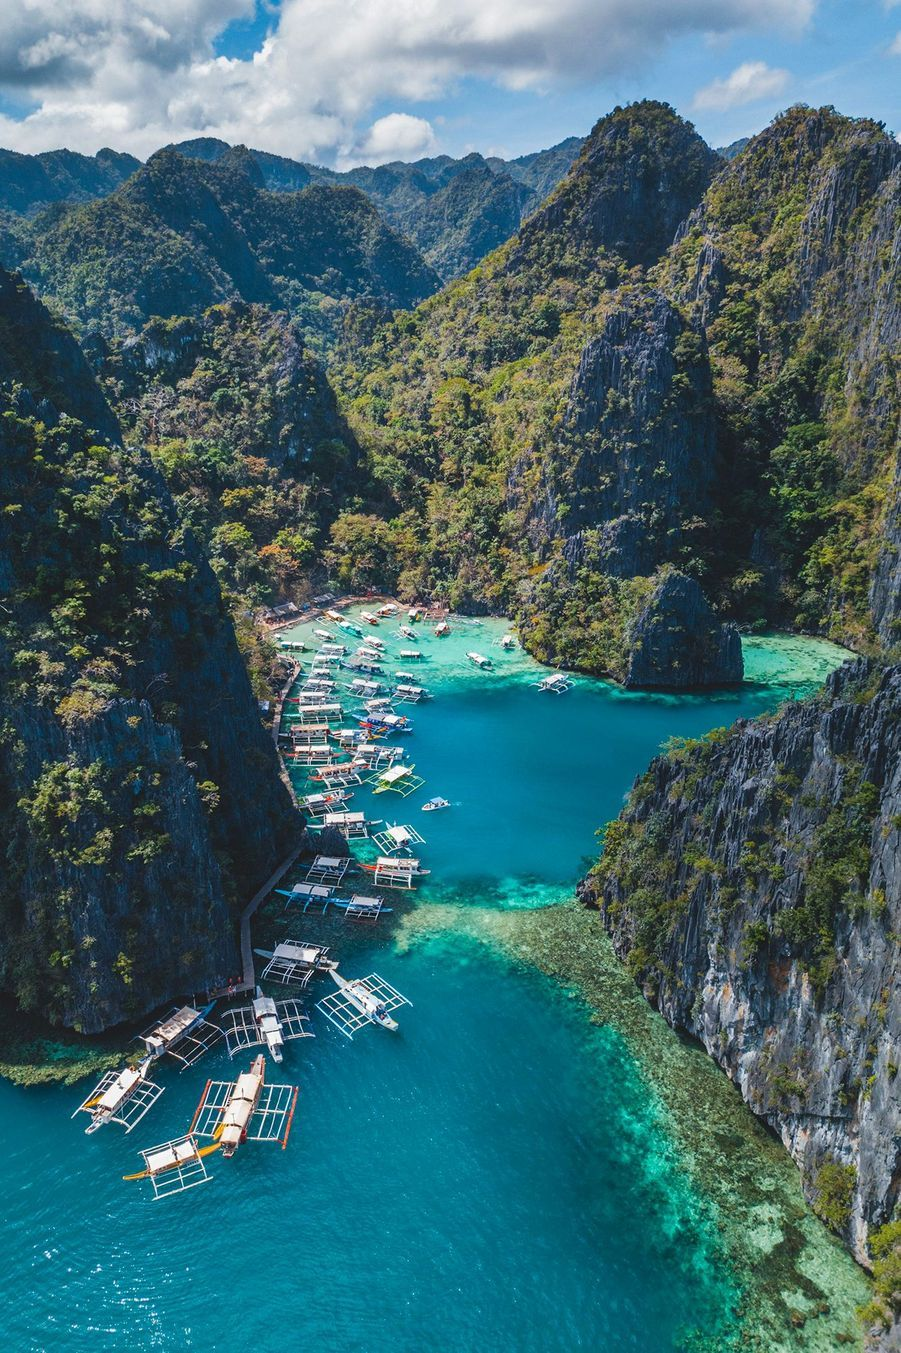 La baie de Coron, Philippines.